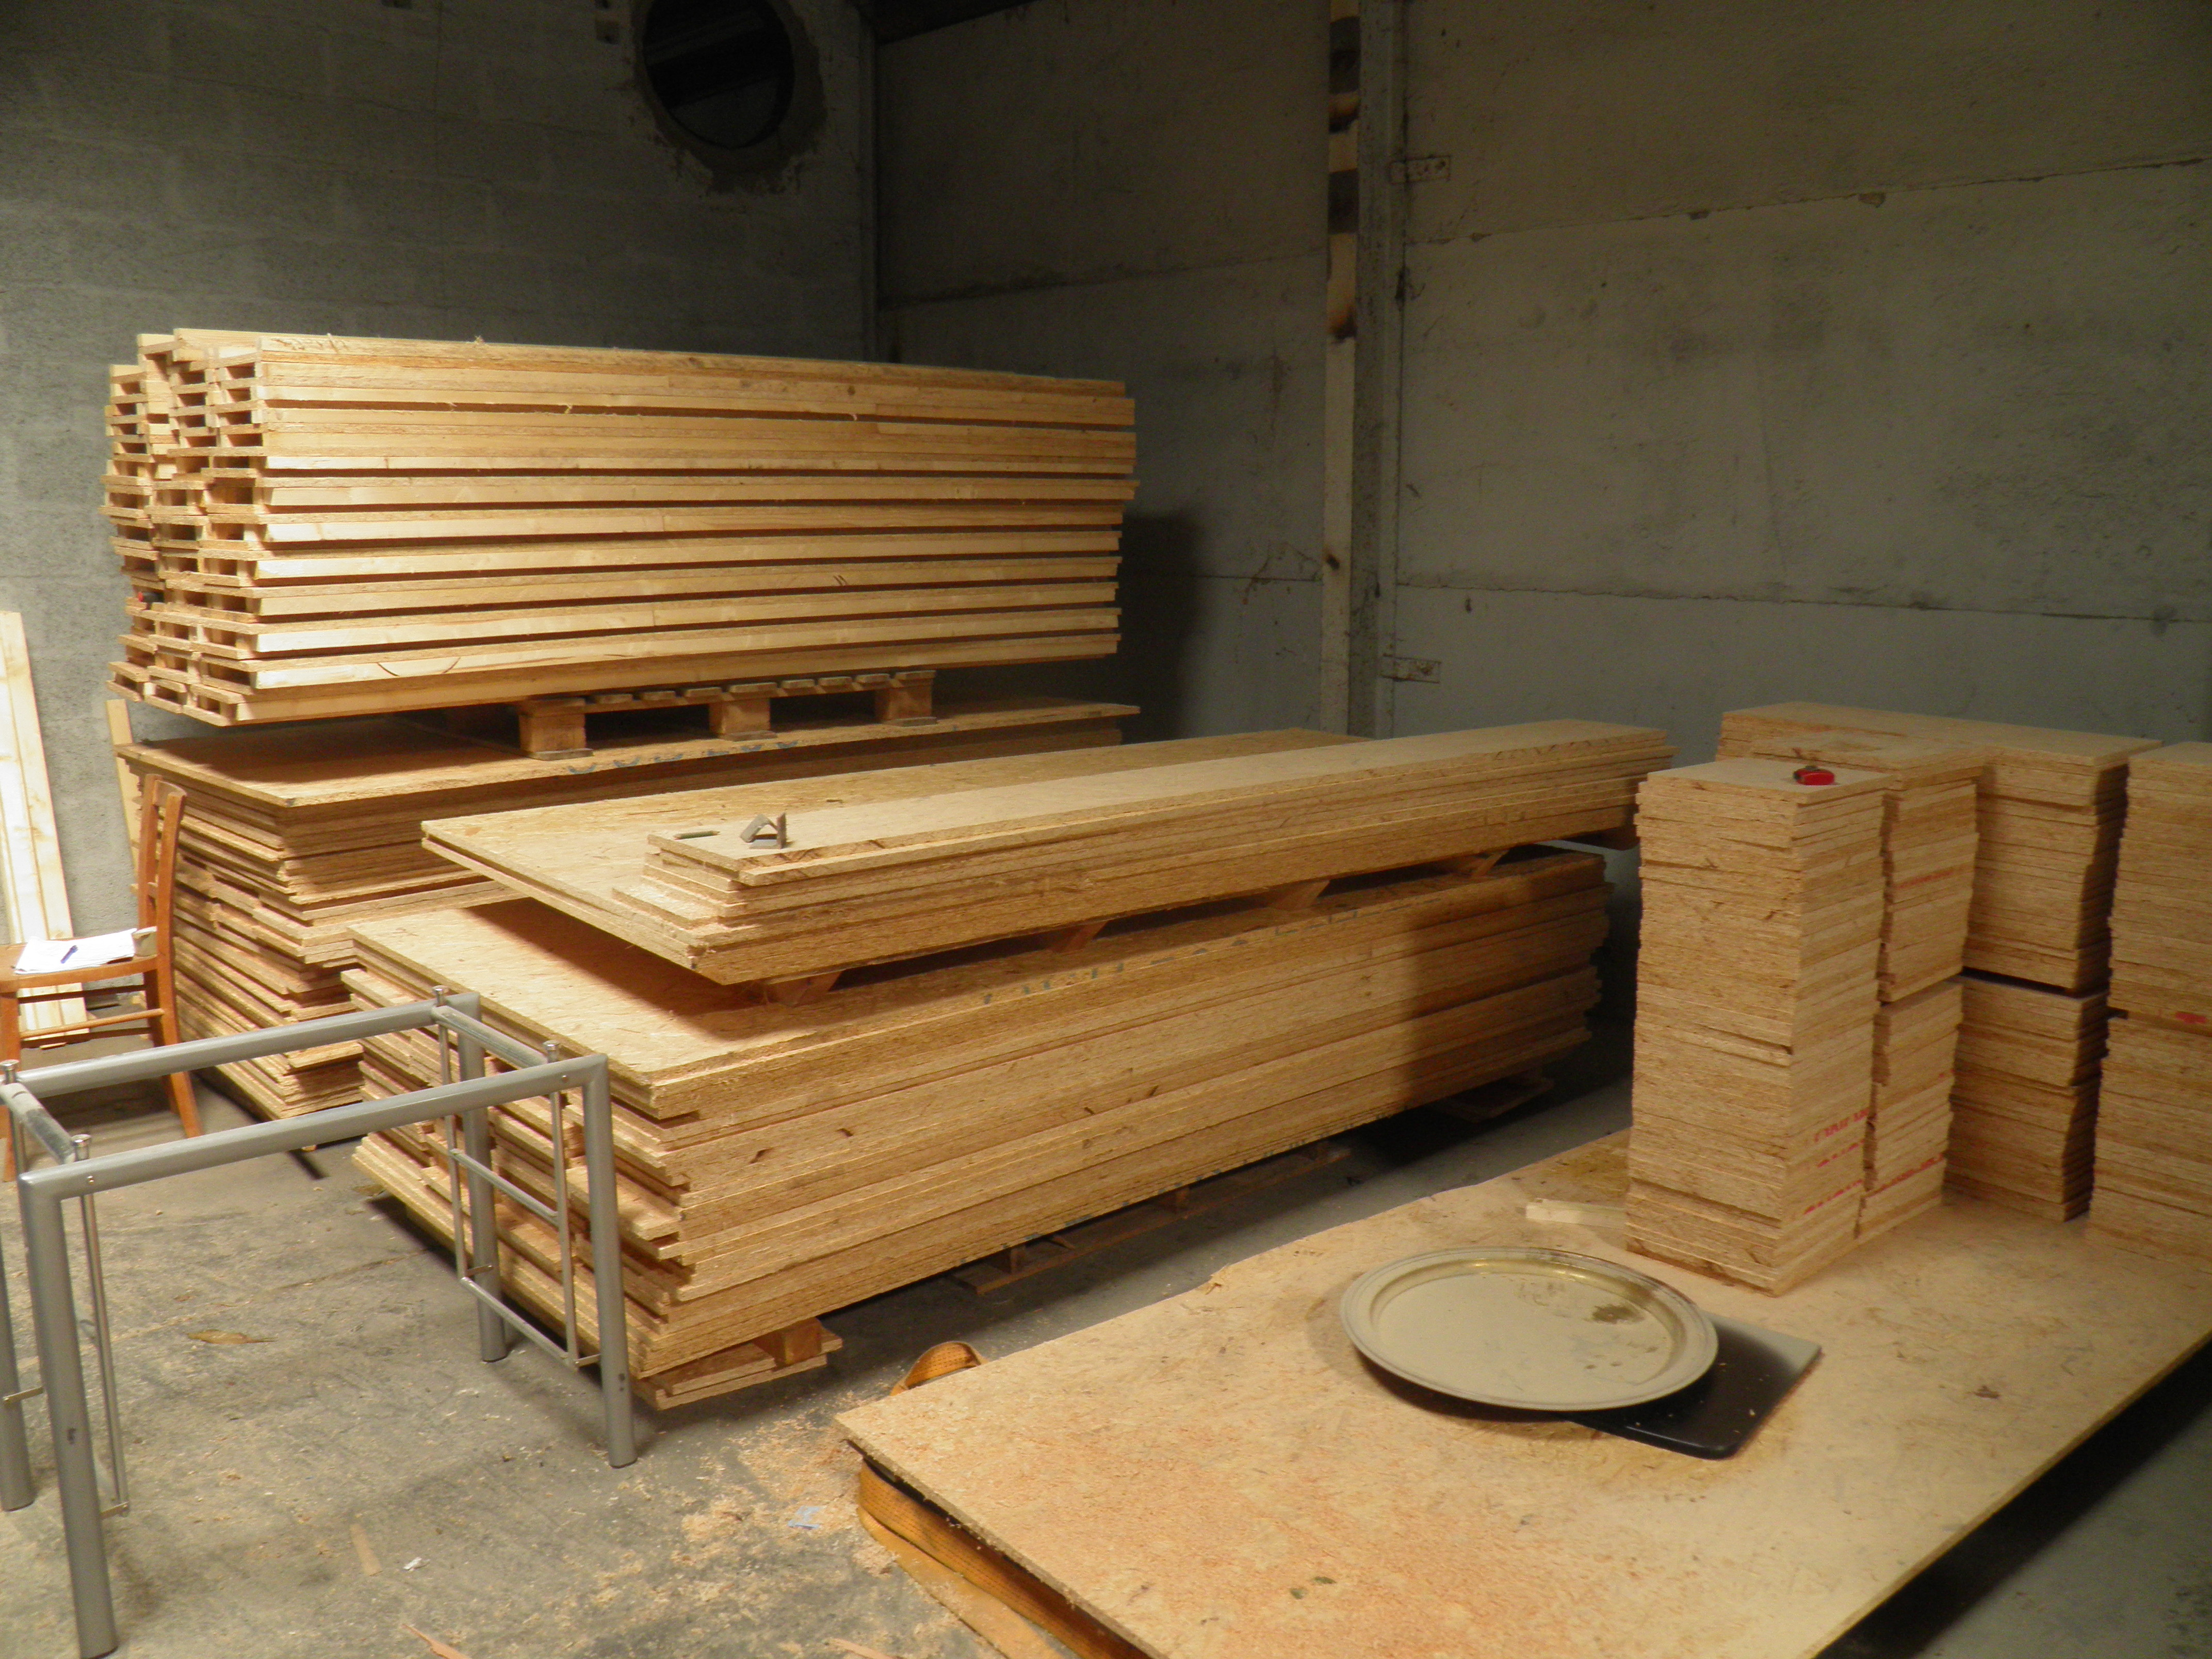 hellomerci construisez votre co maison ronde en bois caner candan. Black Bedroom Furniture Sets. Home Design Ideas